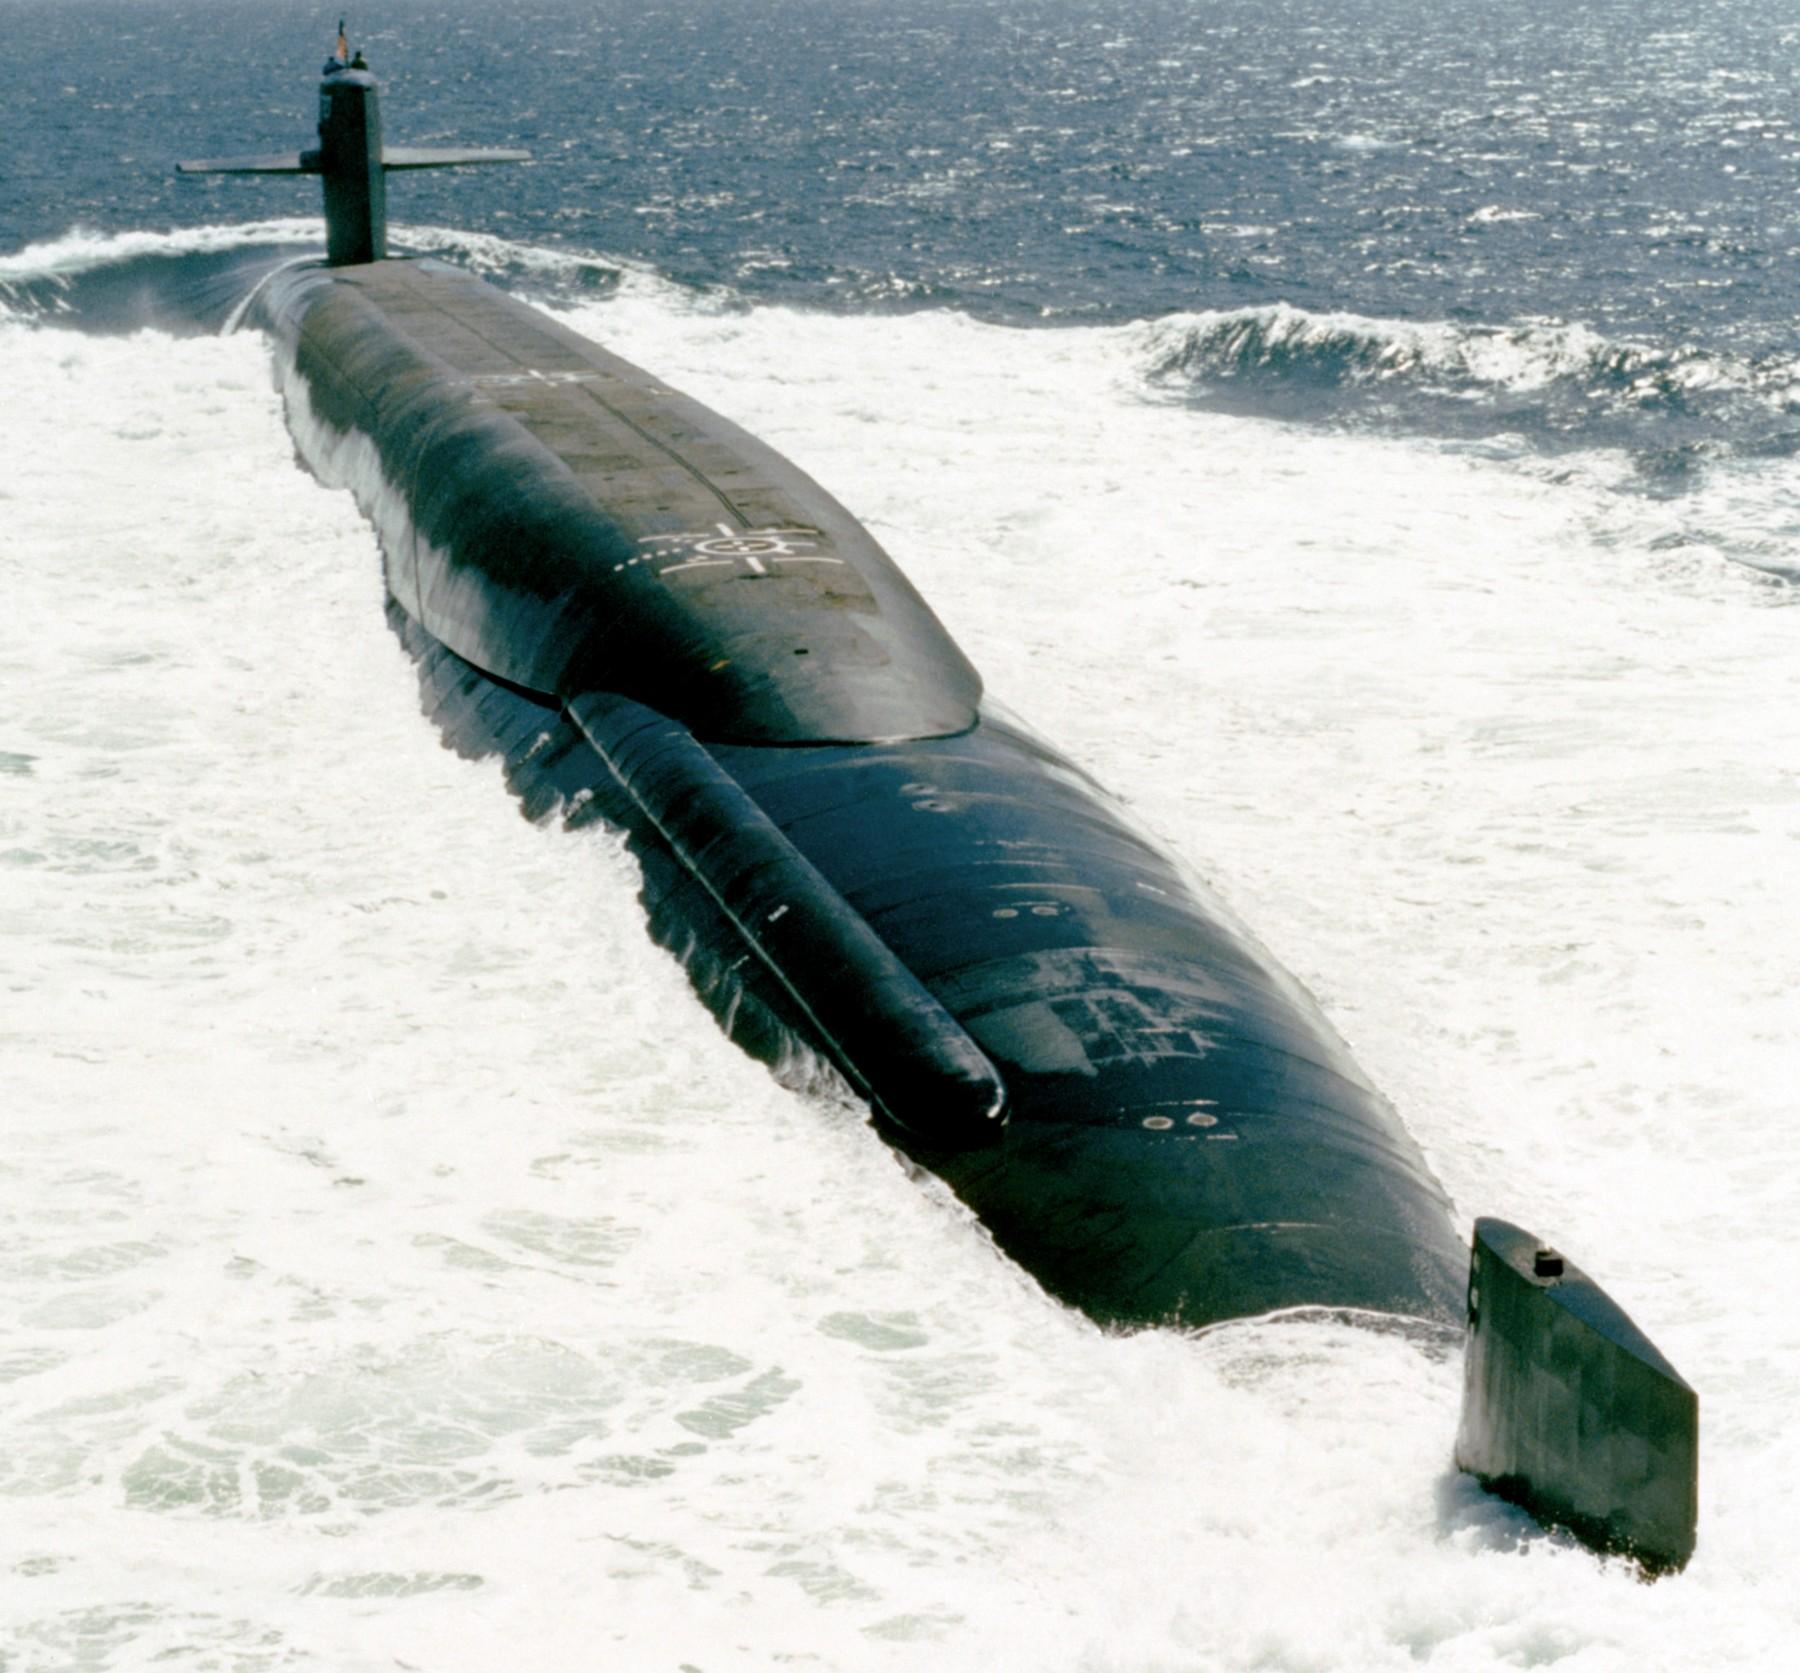 SSGN-727-USS-Michigan-037.jpg